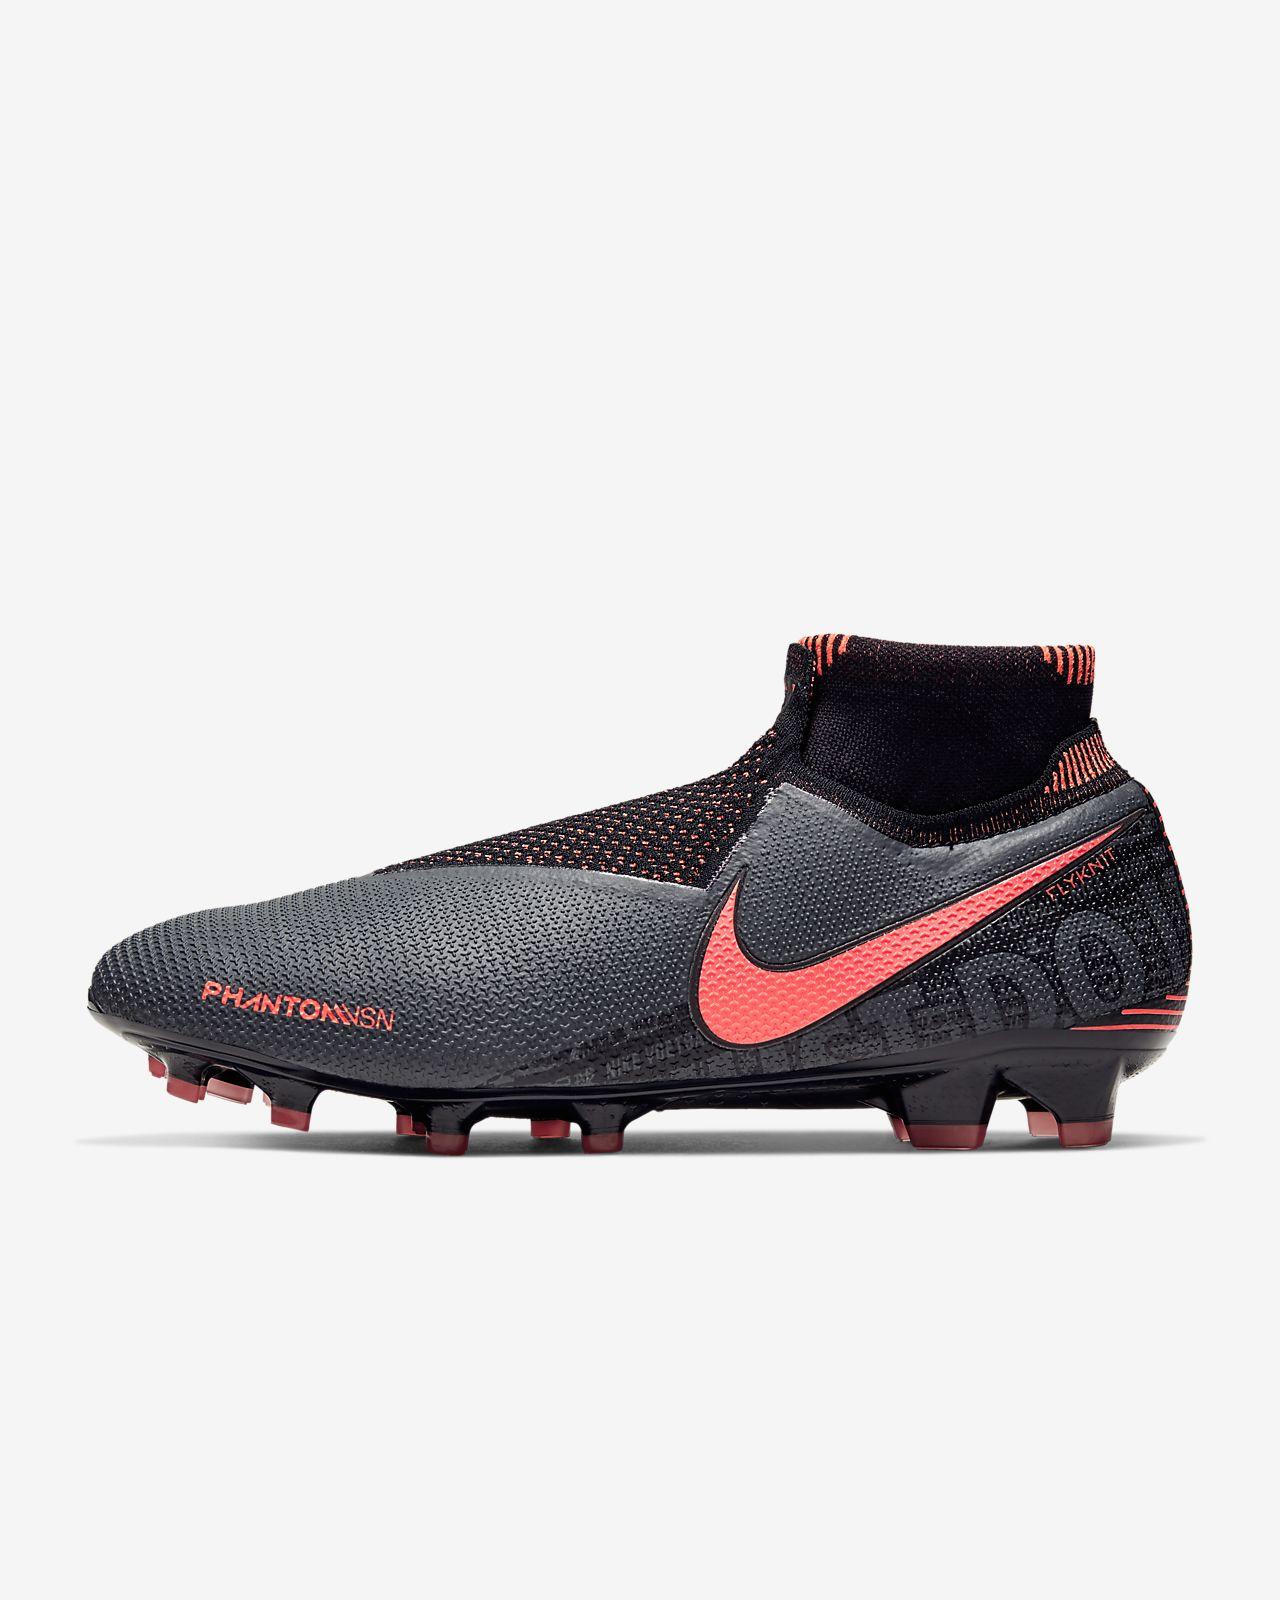 Nike Phantom Vision Elite Dynamic Fit Fg Fussballschuh Fur Normalen Rasen